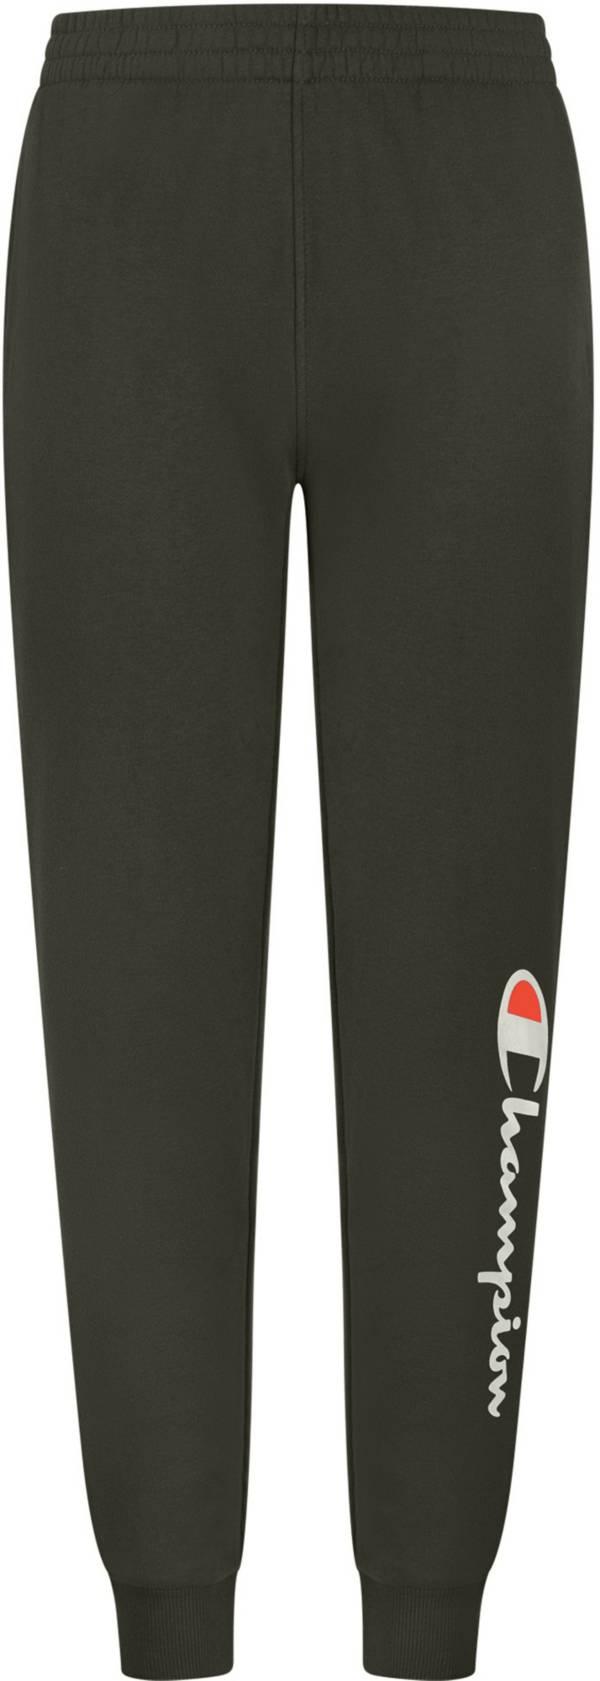 Champion Boys' Signature Fleece Jogger Pants product image